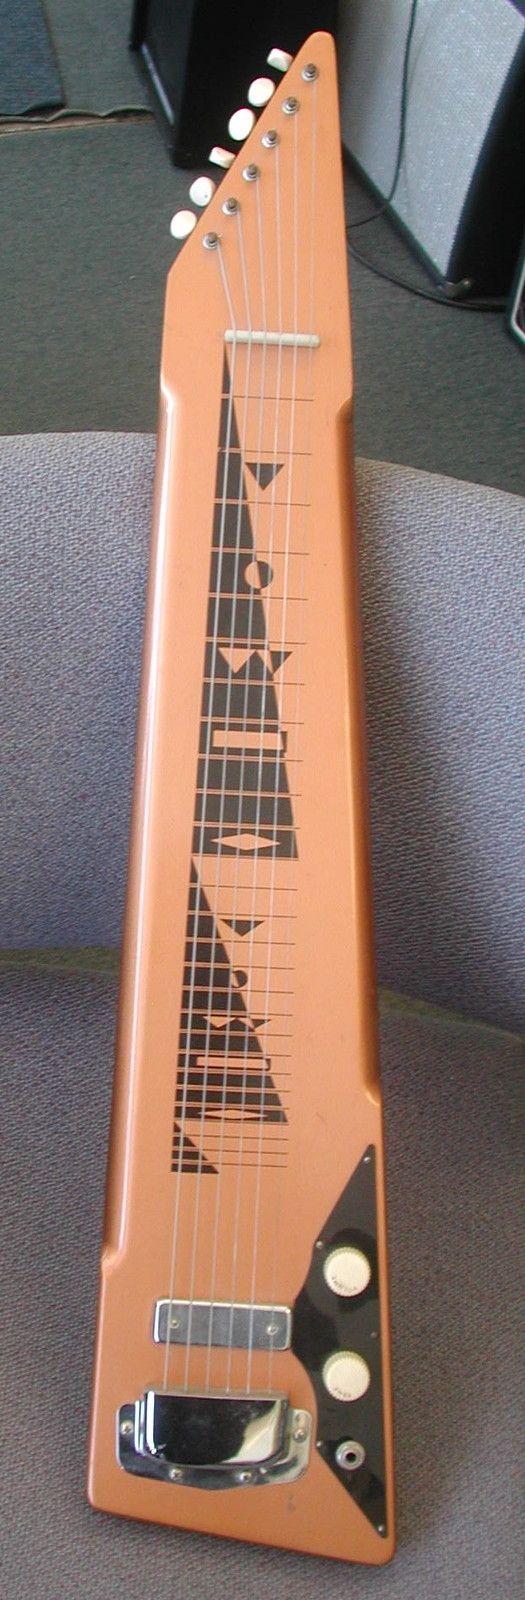 Vintage 1960 S Harmony Hawaiian Lap Steel Guitar Plays